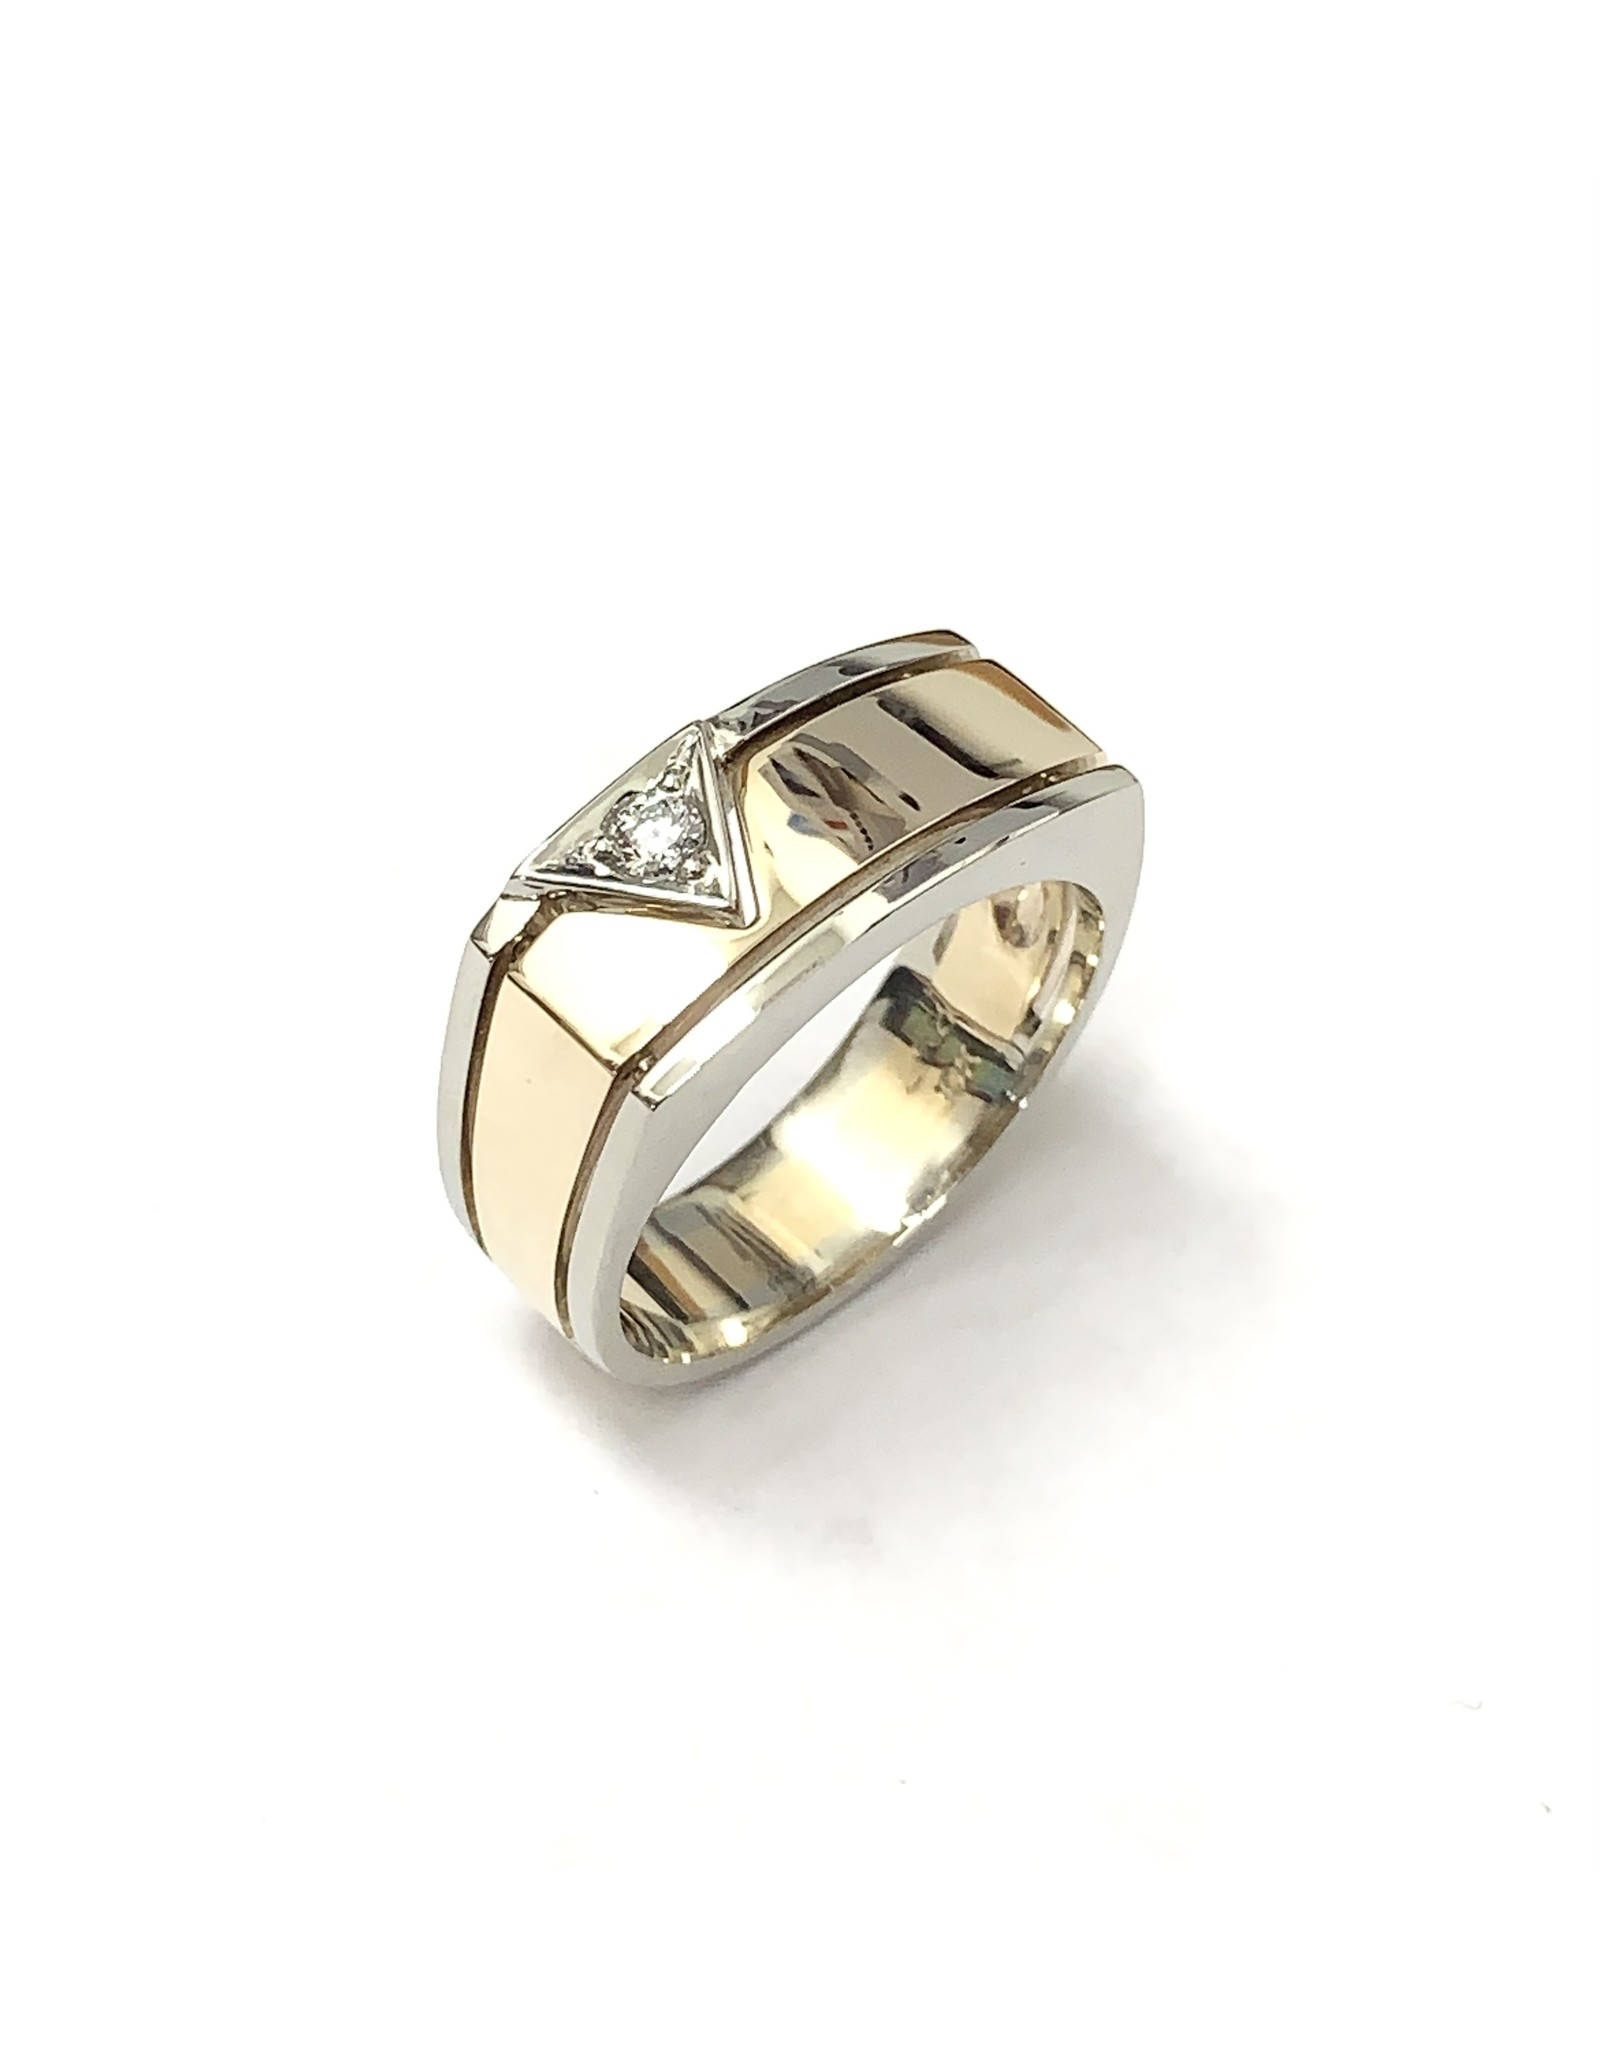 0.095ct Diamond Ring 10KWY Gold